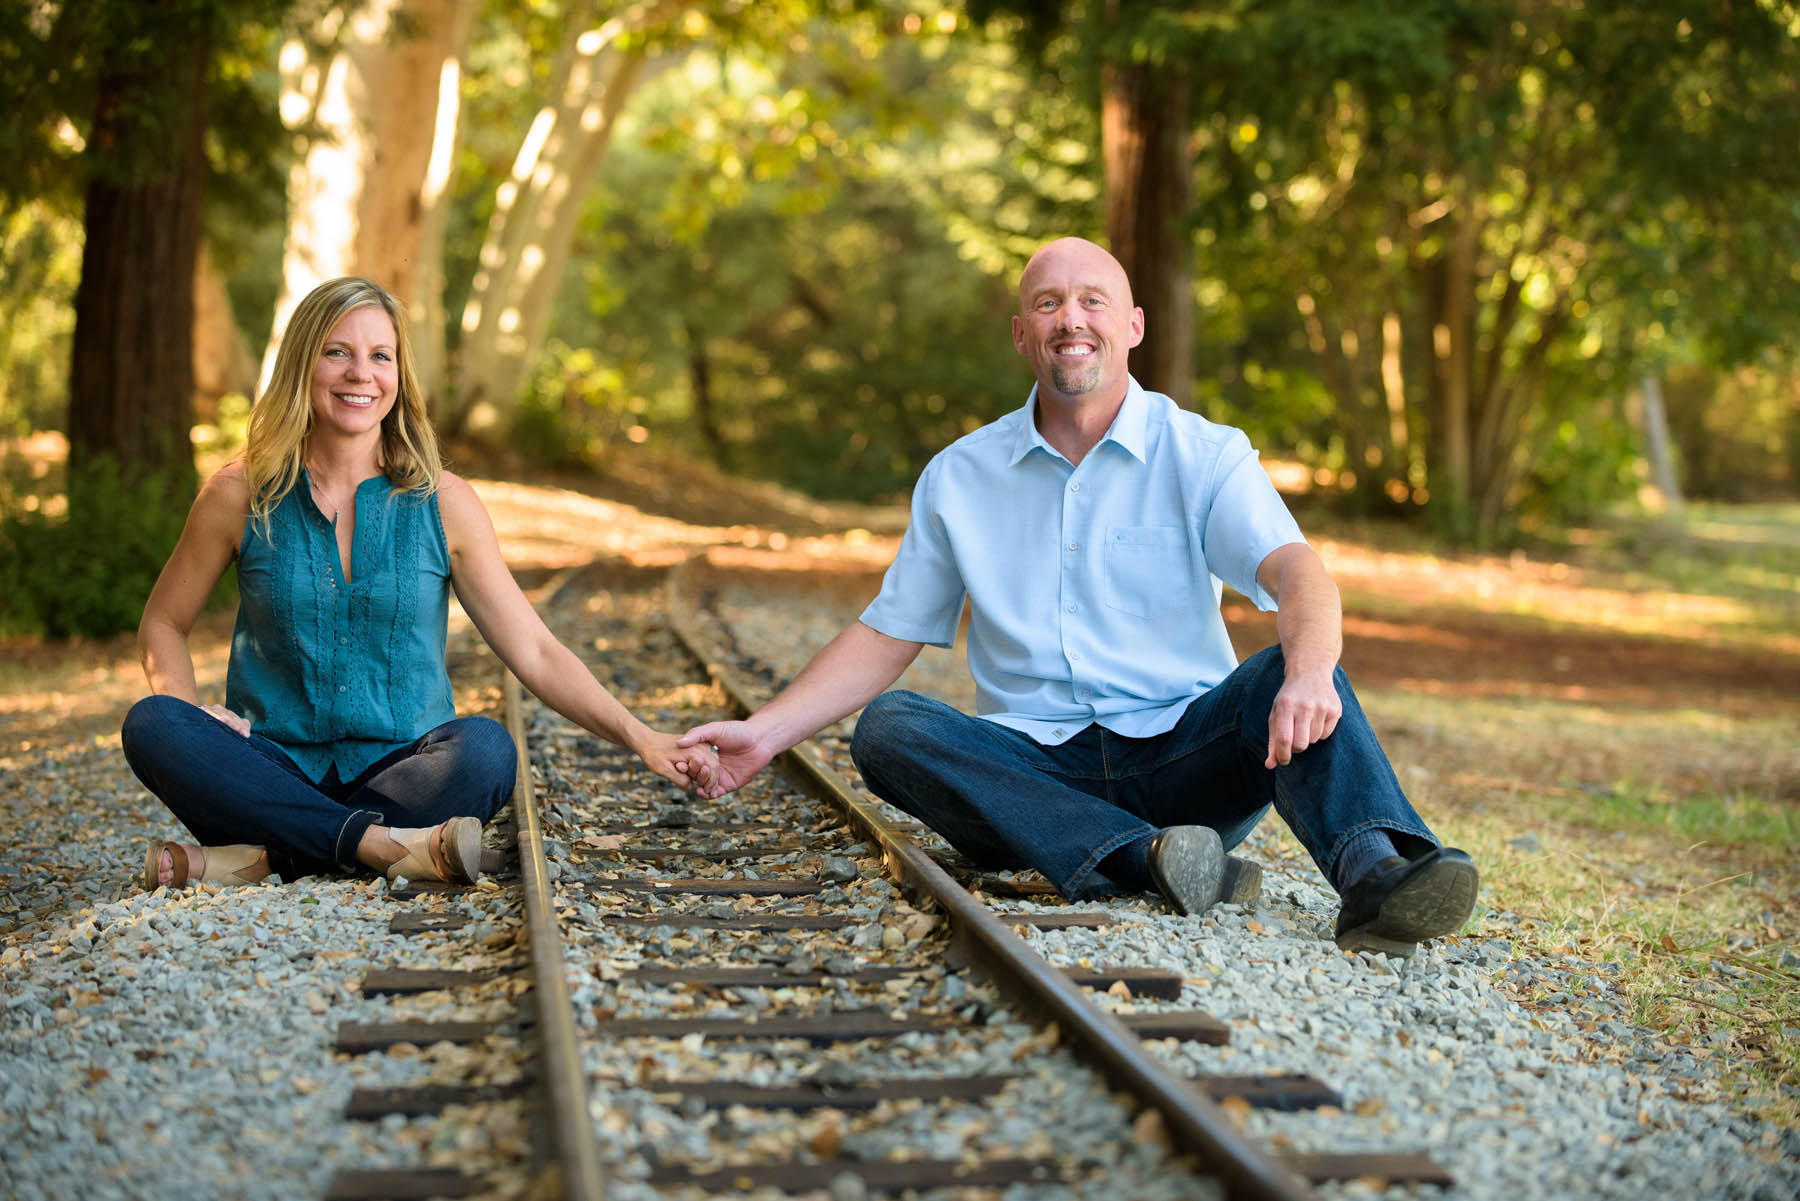 8251_d810_Sarah_and_Steve_Vasona_Park_Family_and_Engagement_Photography.jpg